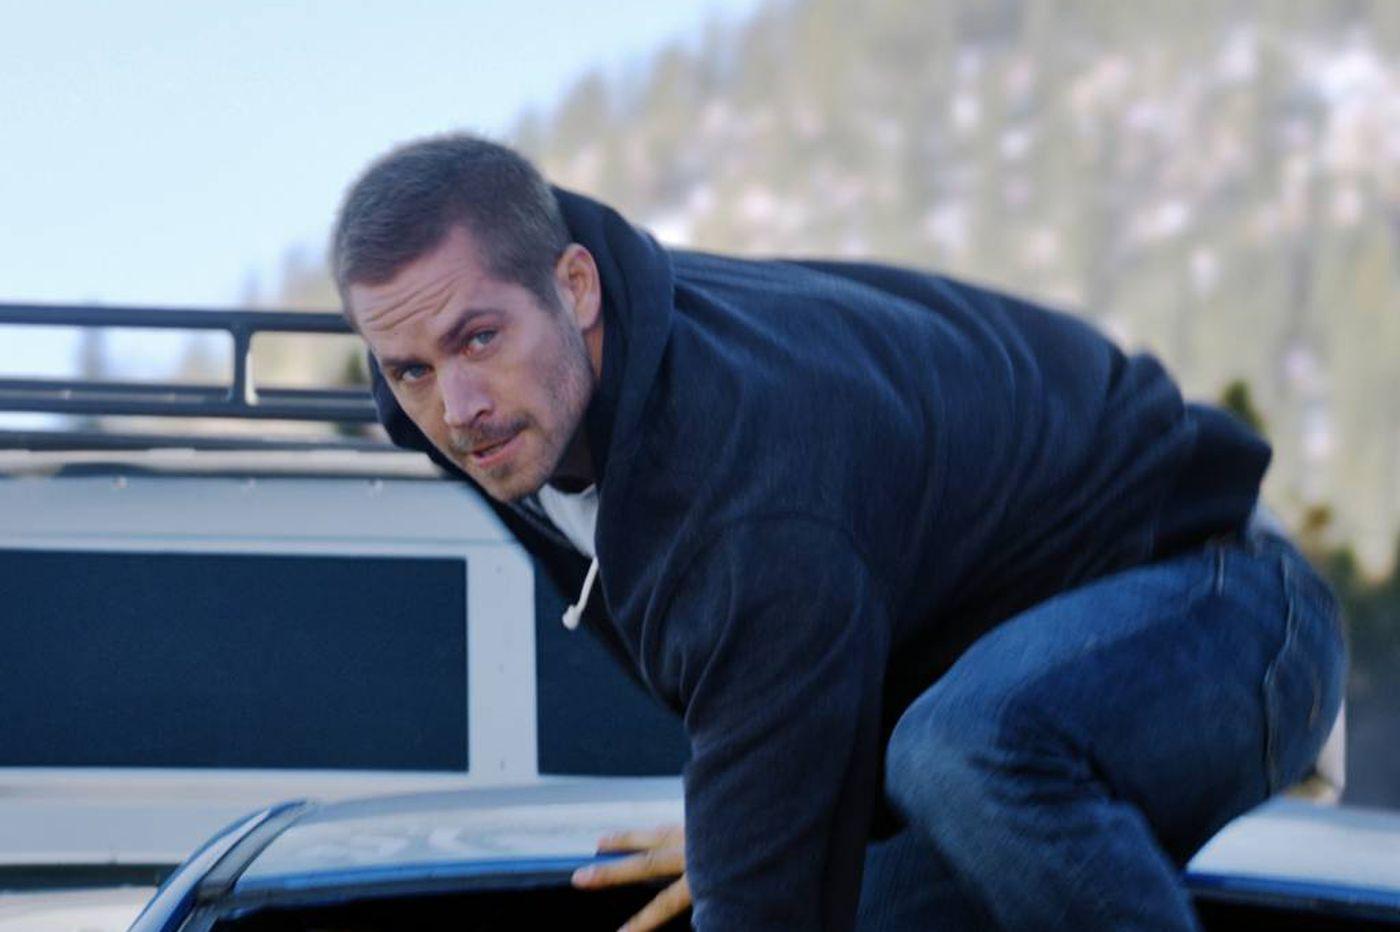 'Furious 7': The best kind of dumb fun